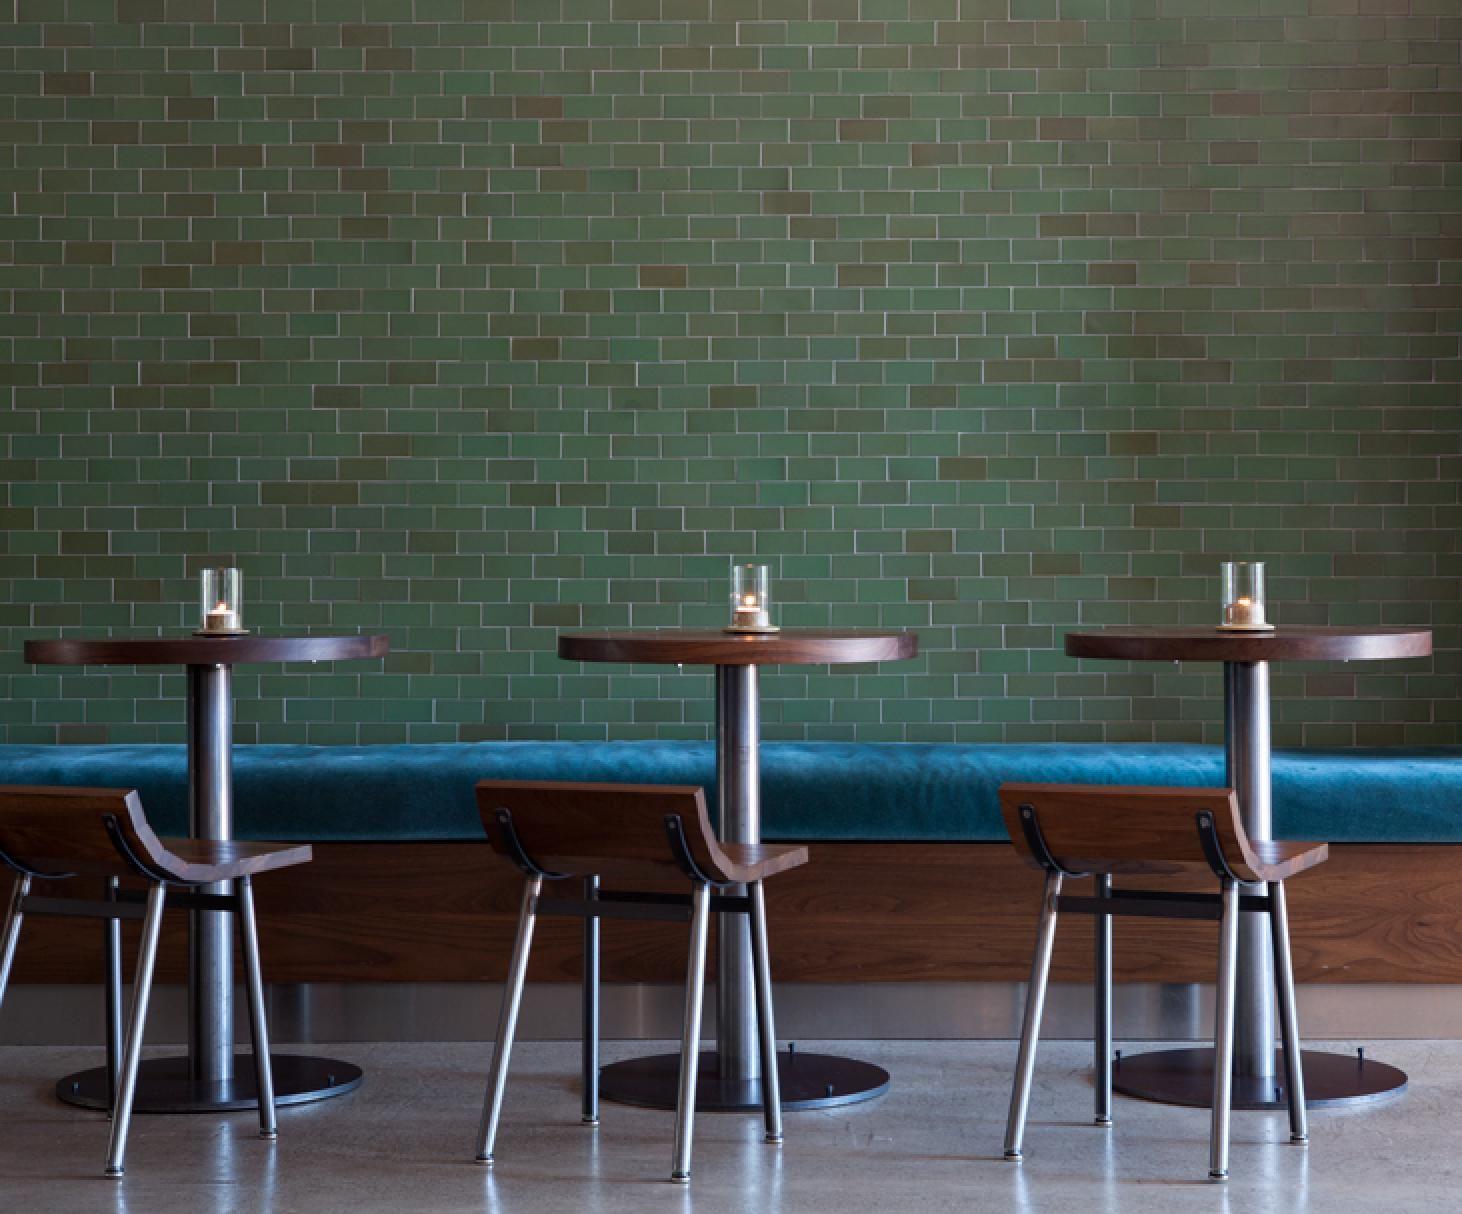 Heath Ceramics: Marin's Farmshop restaurant shows off the